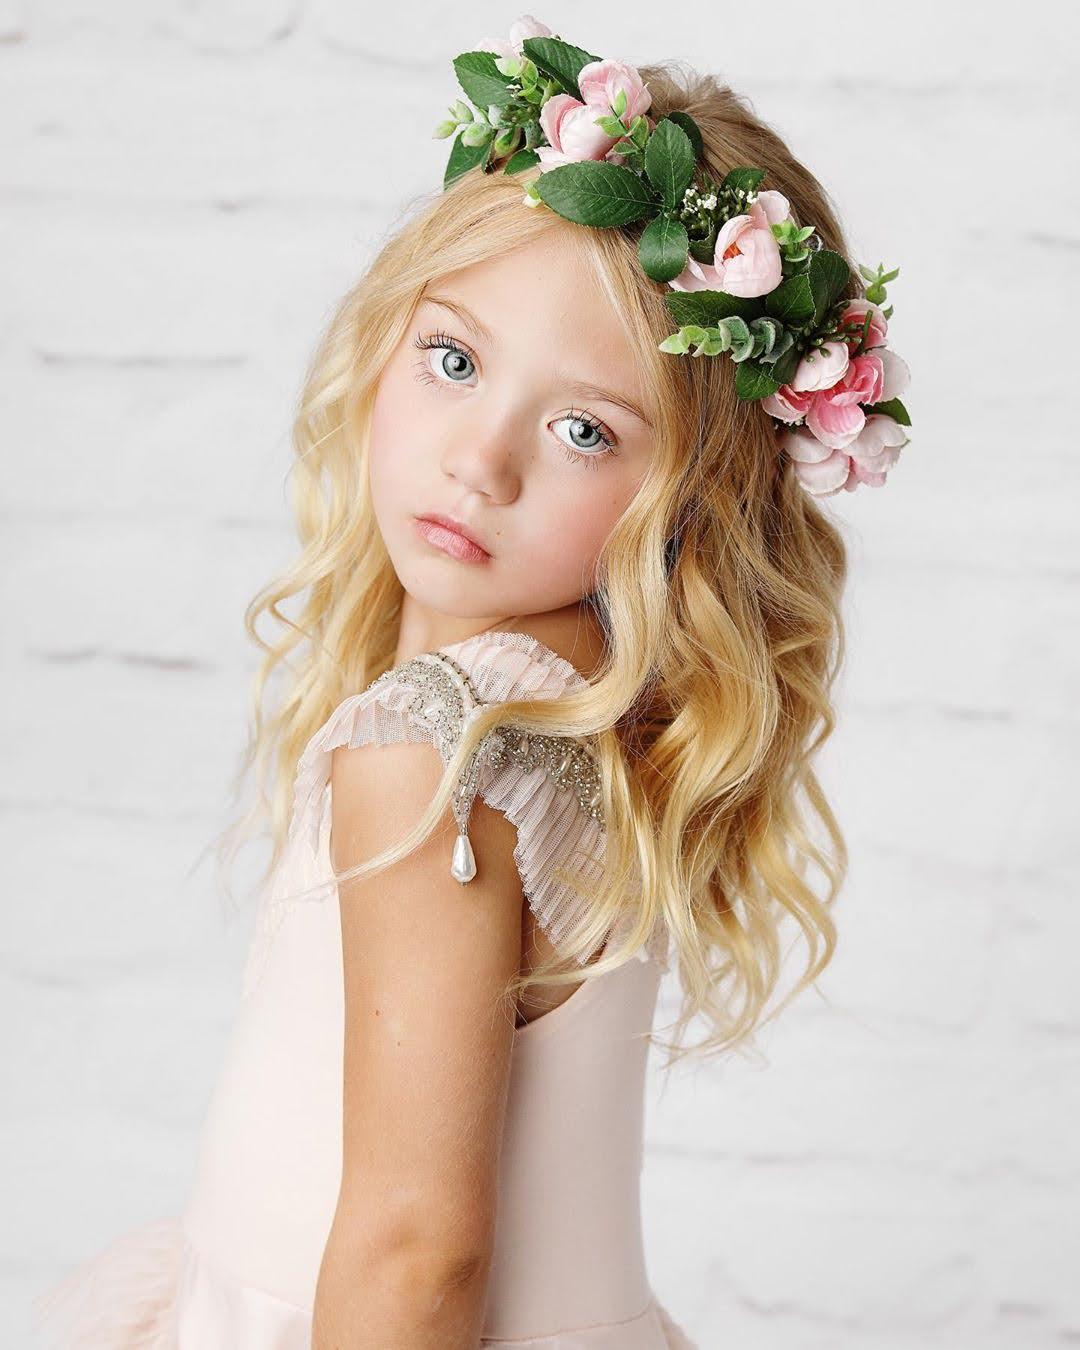 Everleigh Rose 8